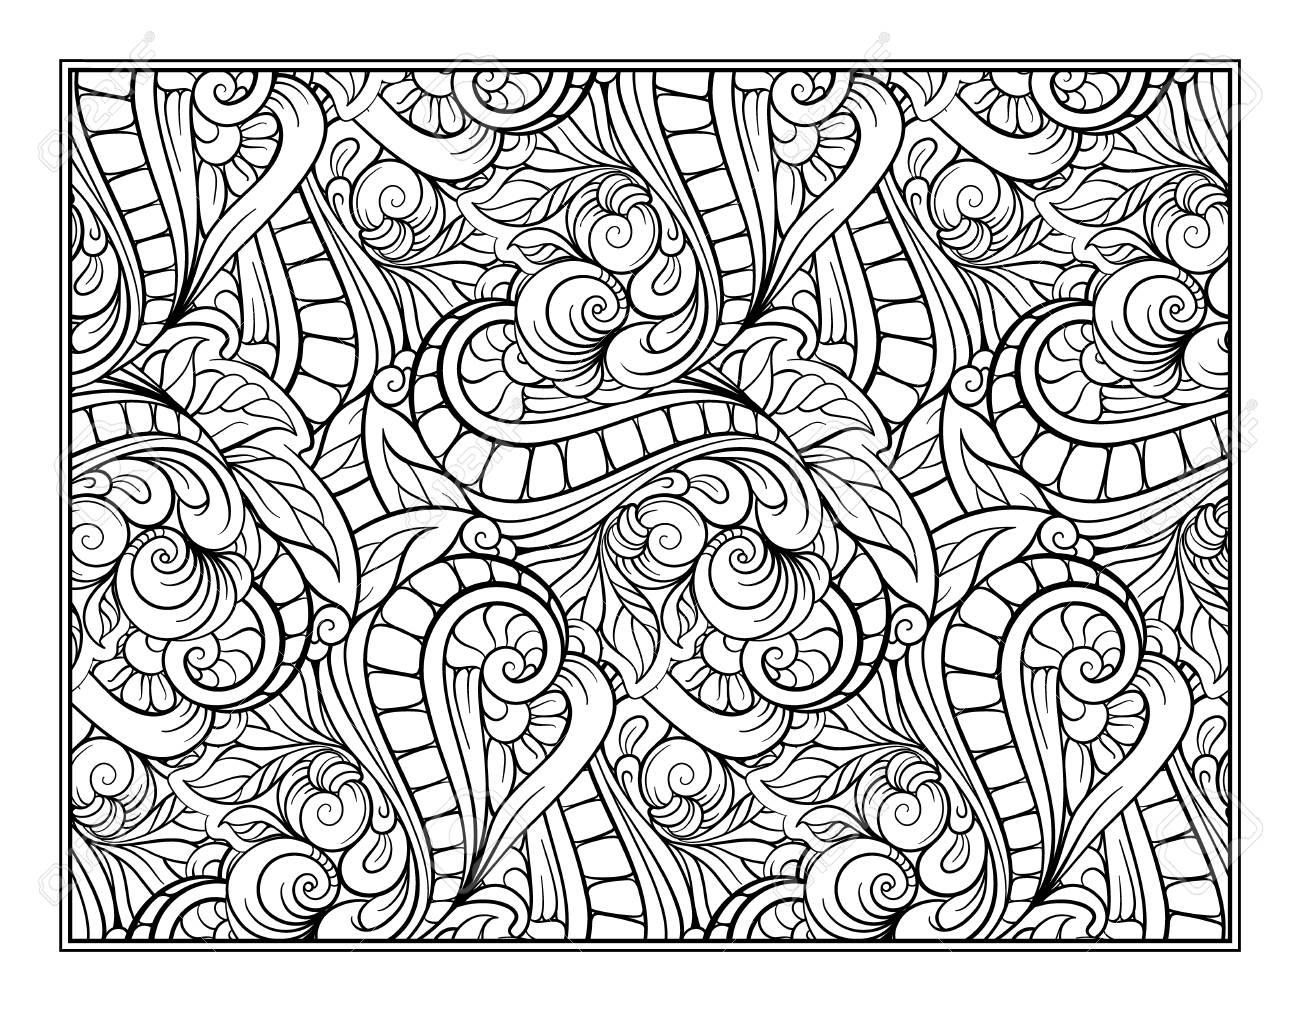 Paisley Und Mandalamuster Im Rahmen Ausmalbilder Zum Ausmalen